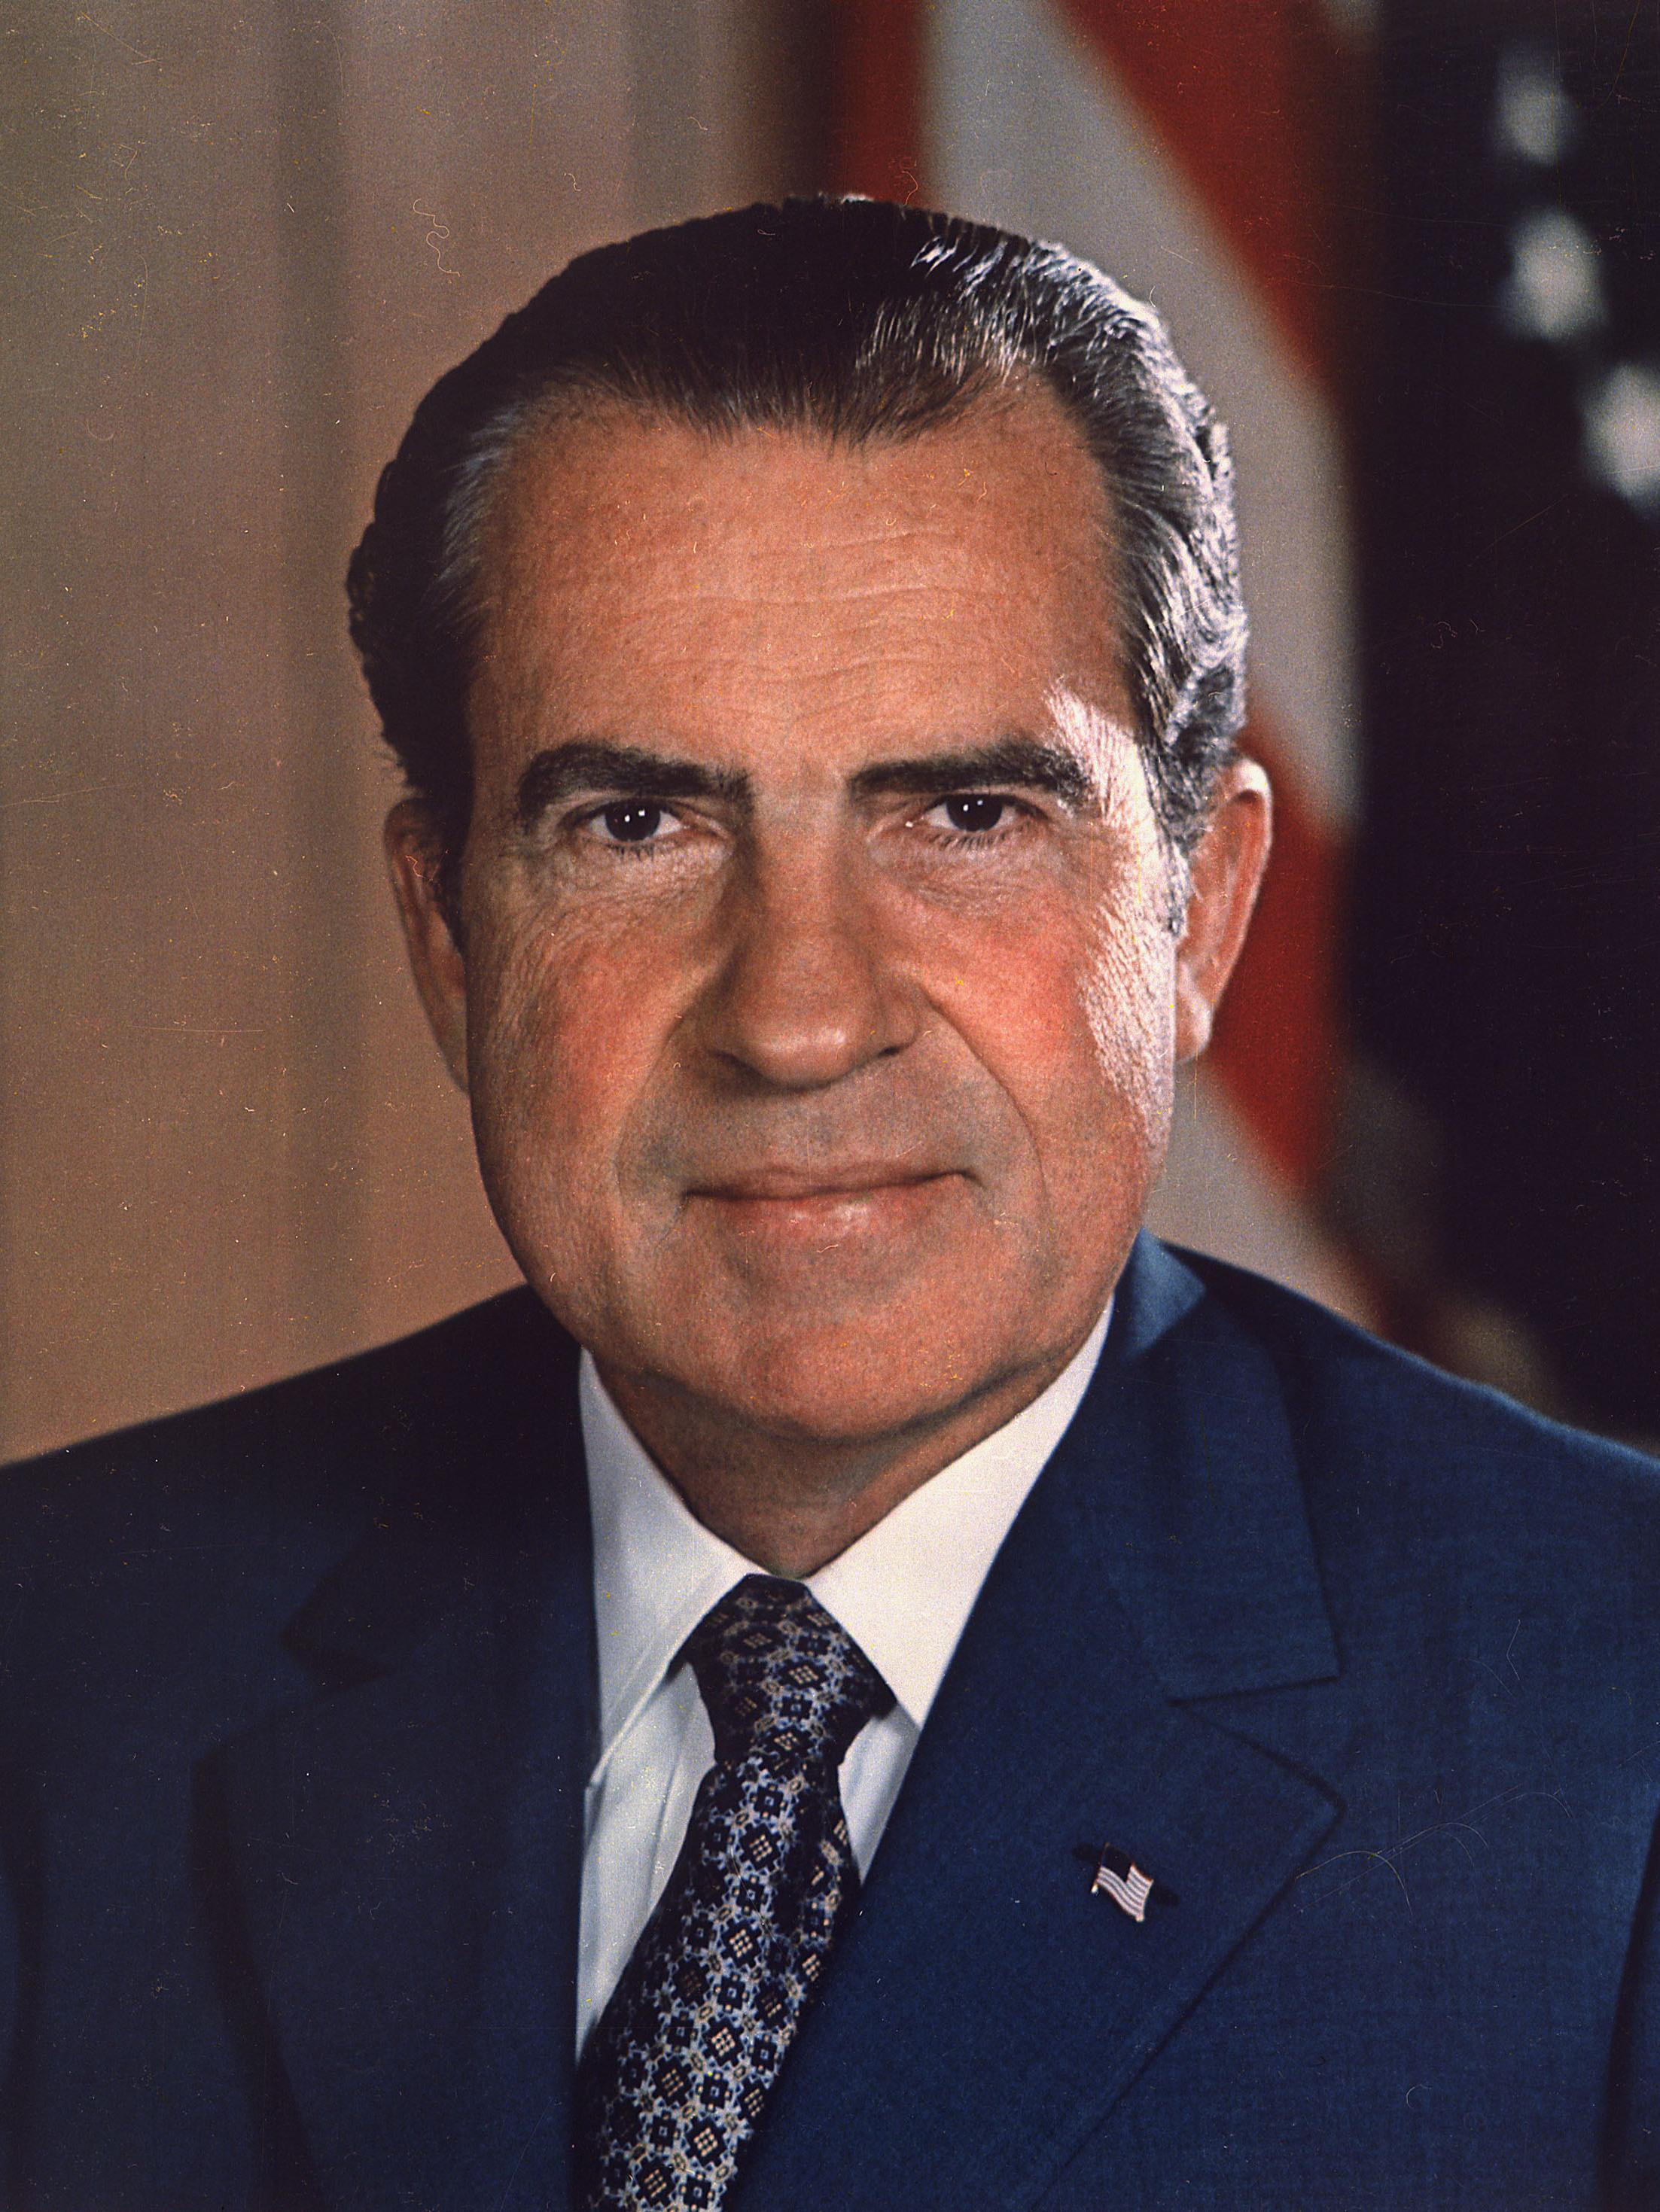 Richard Nixon Saddle River New Jersey